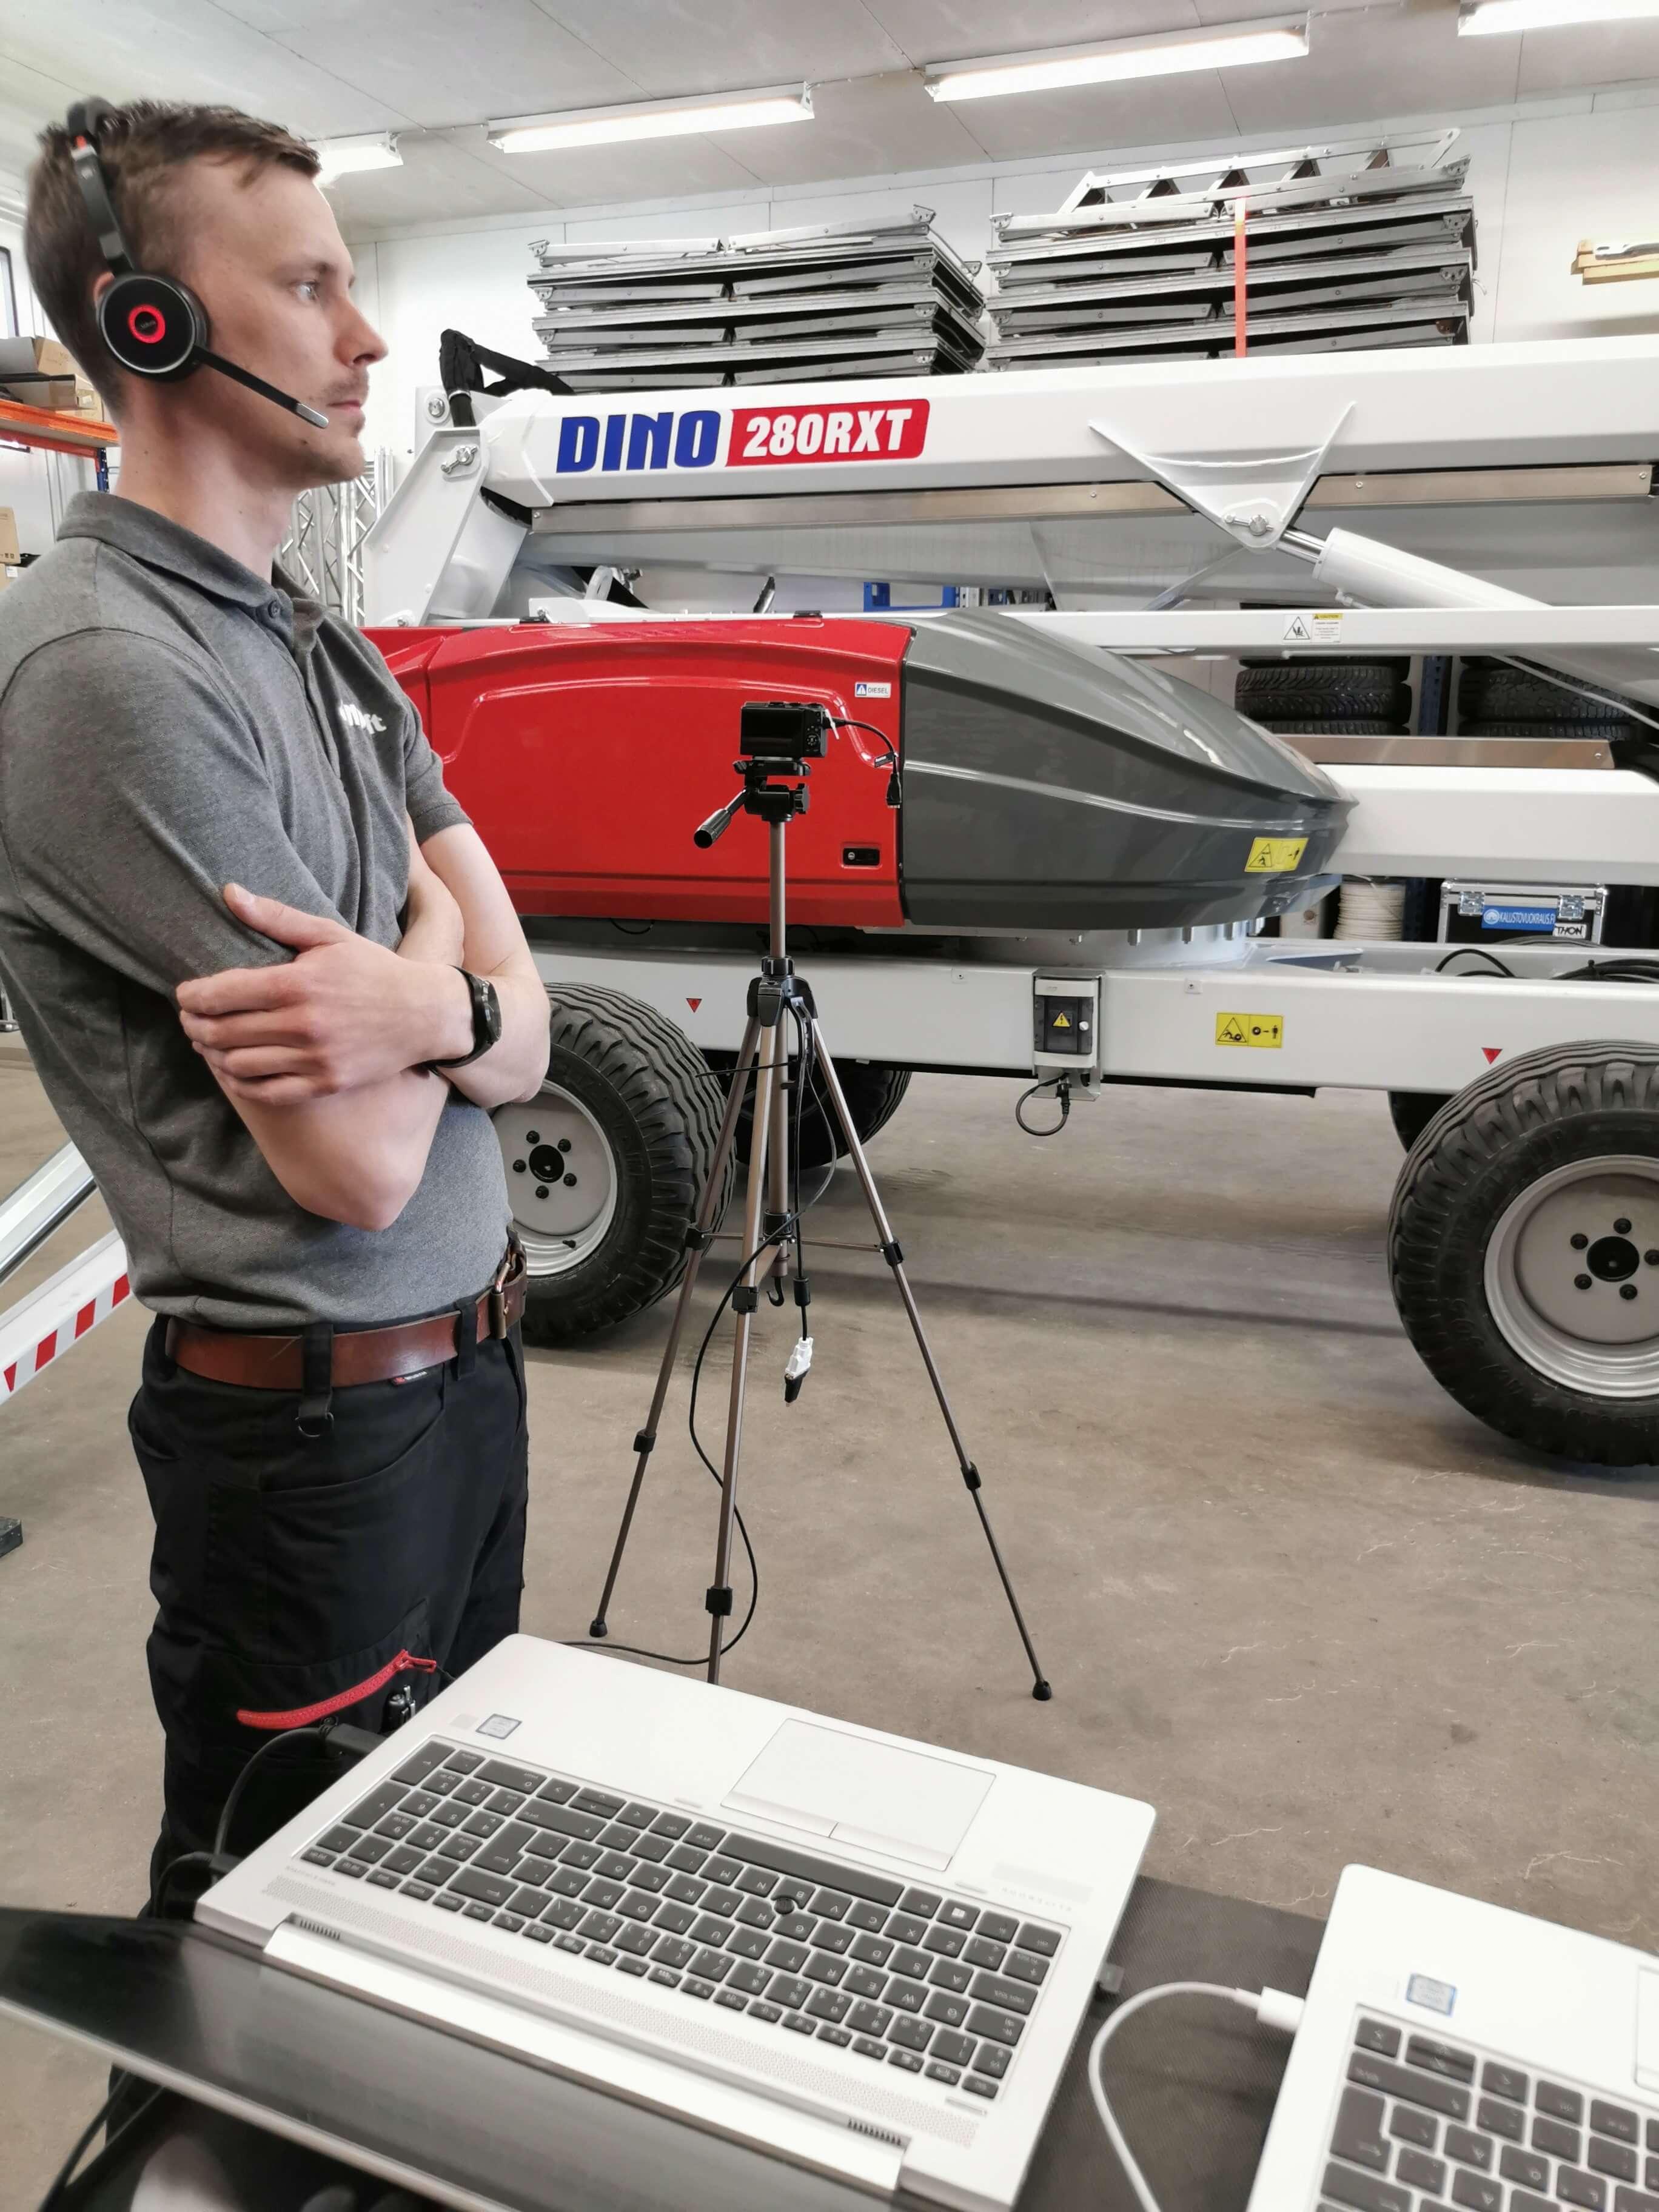 Jussi_Saarikallio_Dinolift_on_air_virtual_training